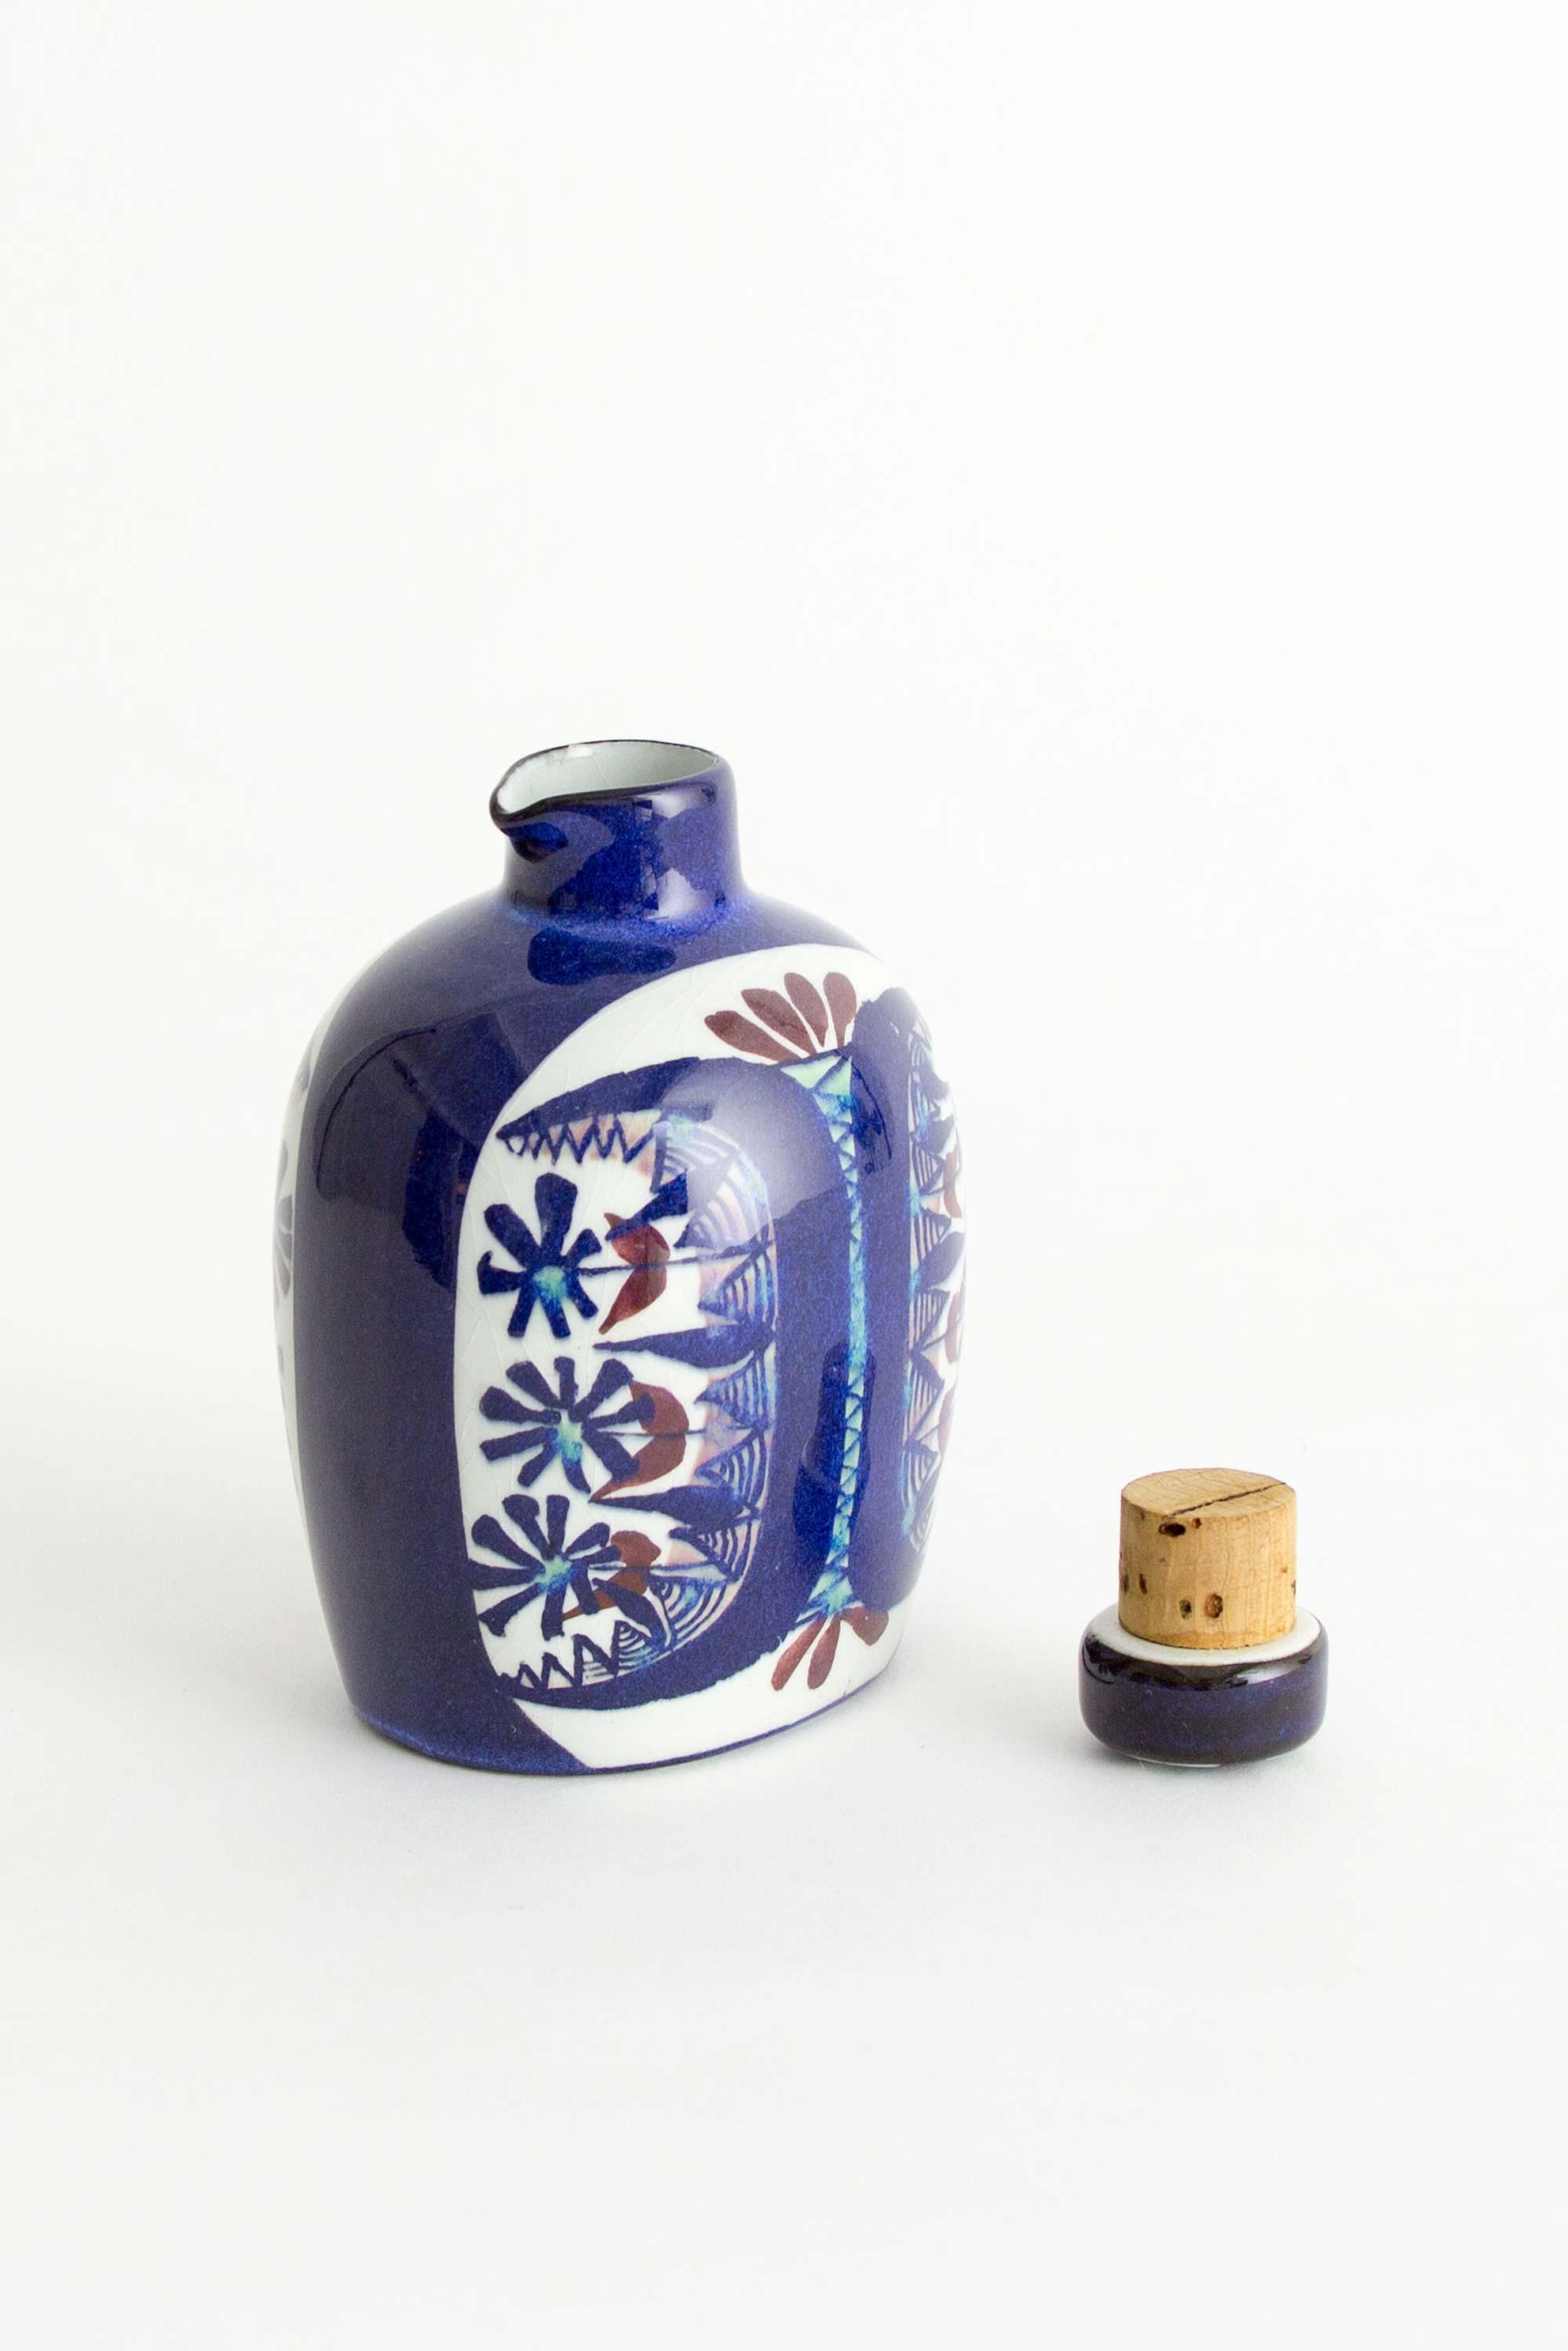 Bottle designed by Marianne Johnson